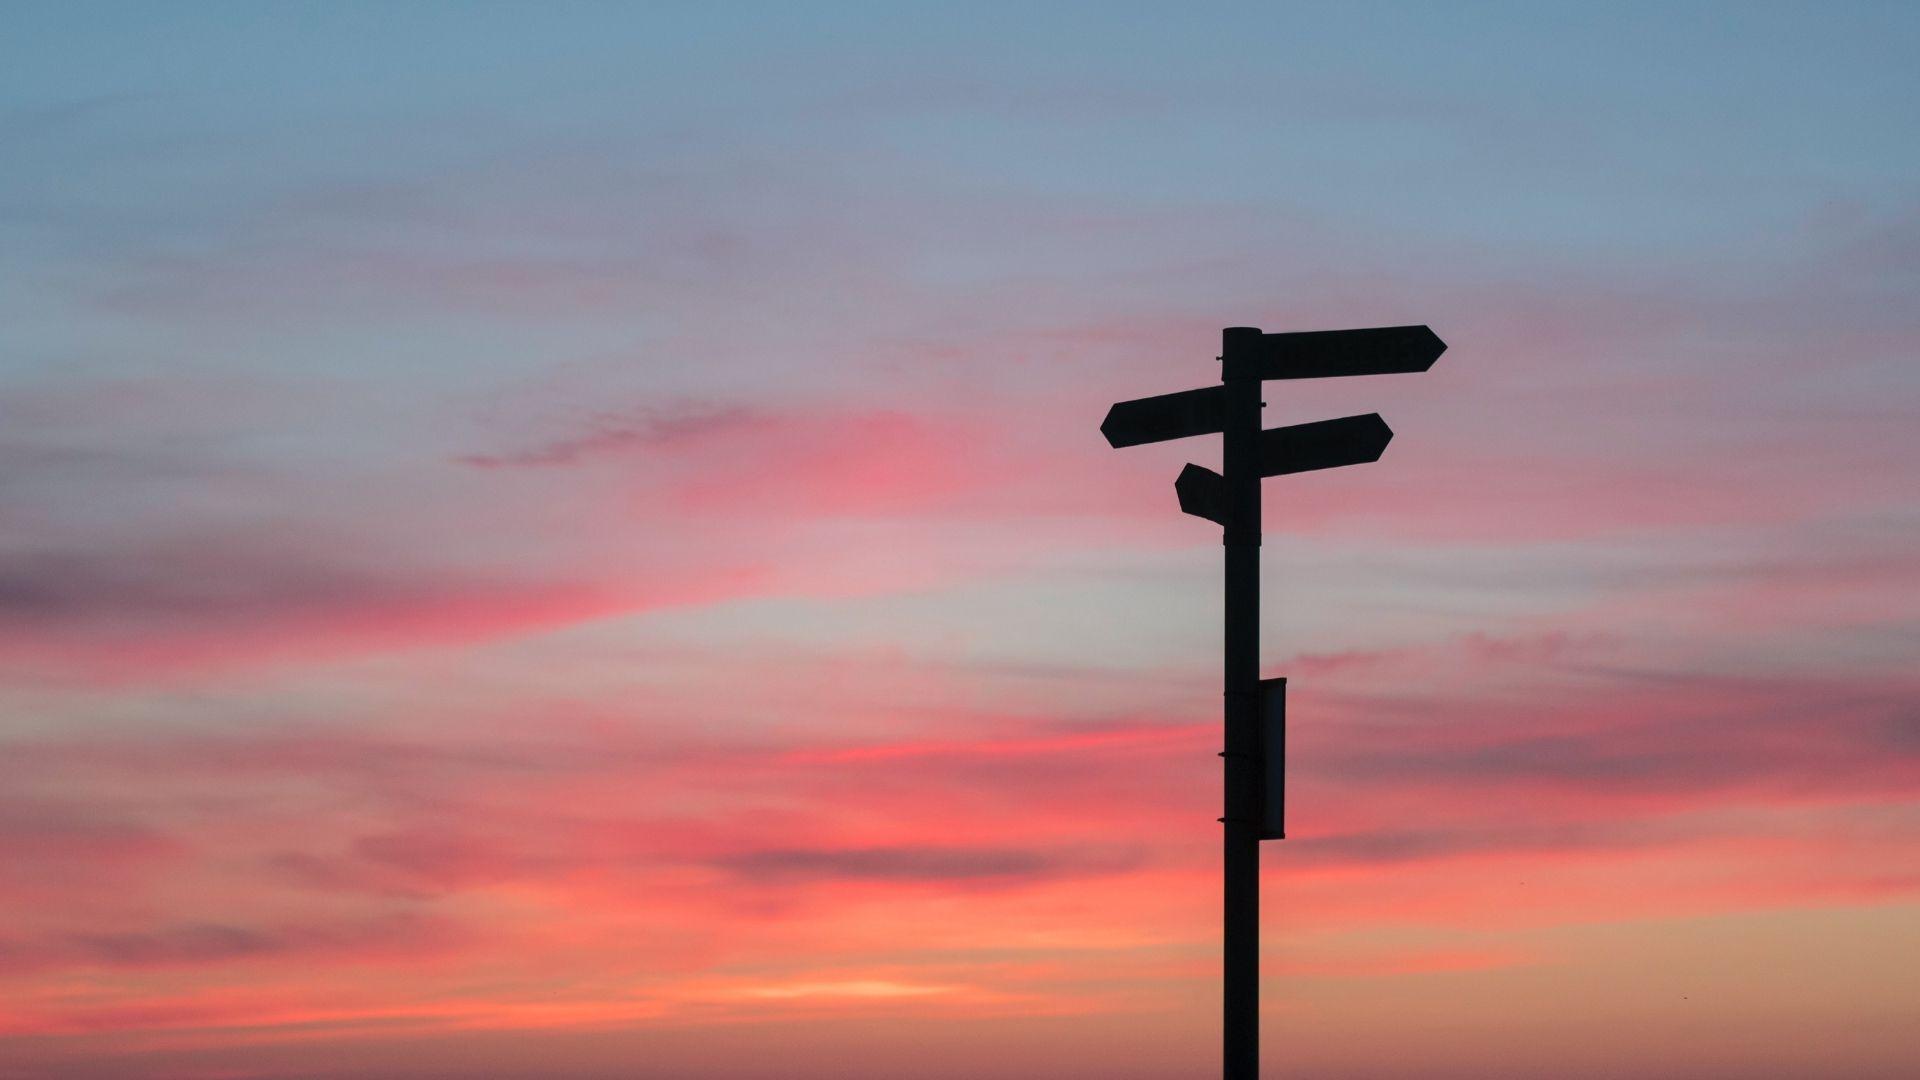 Sun setting on signposts